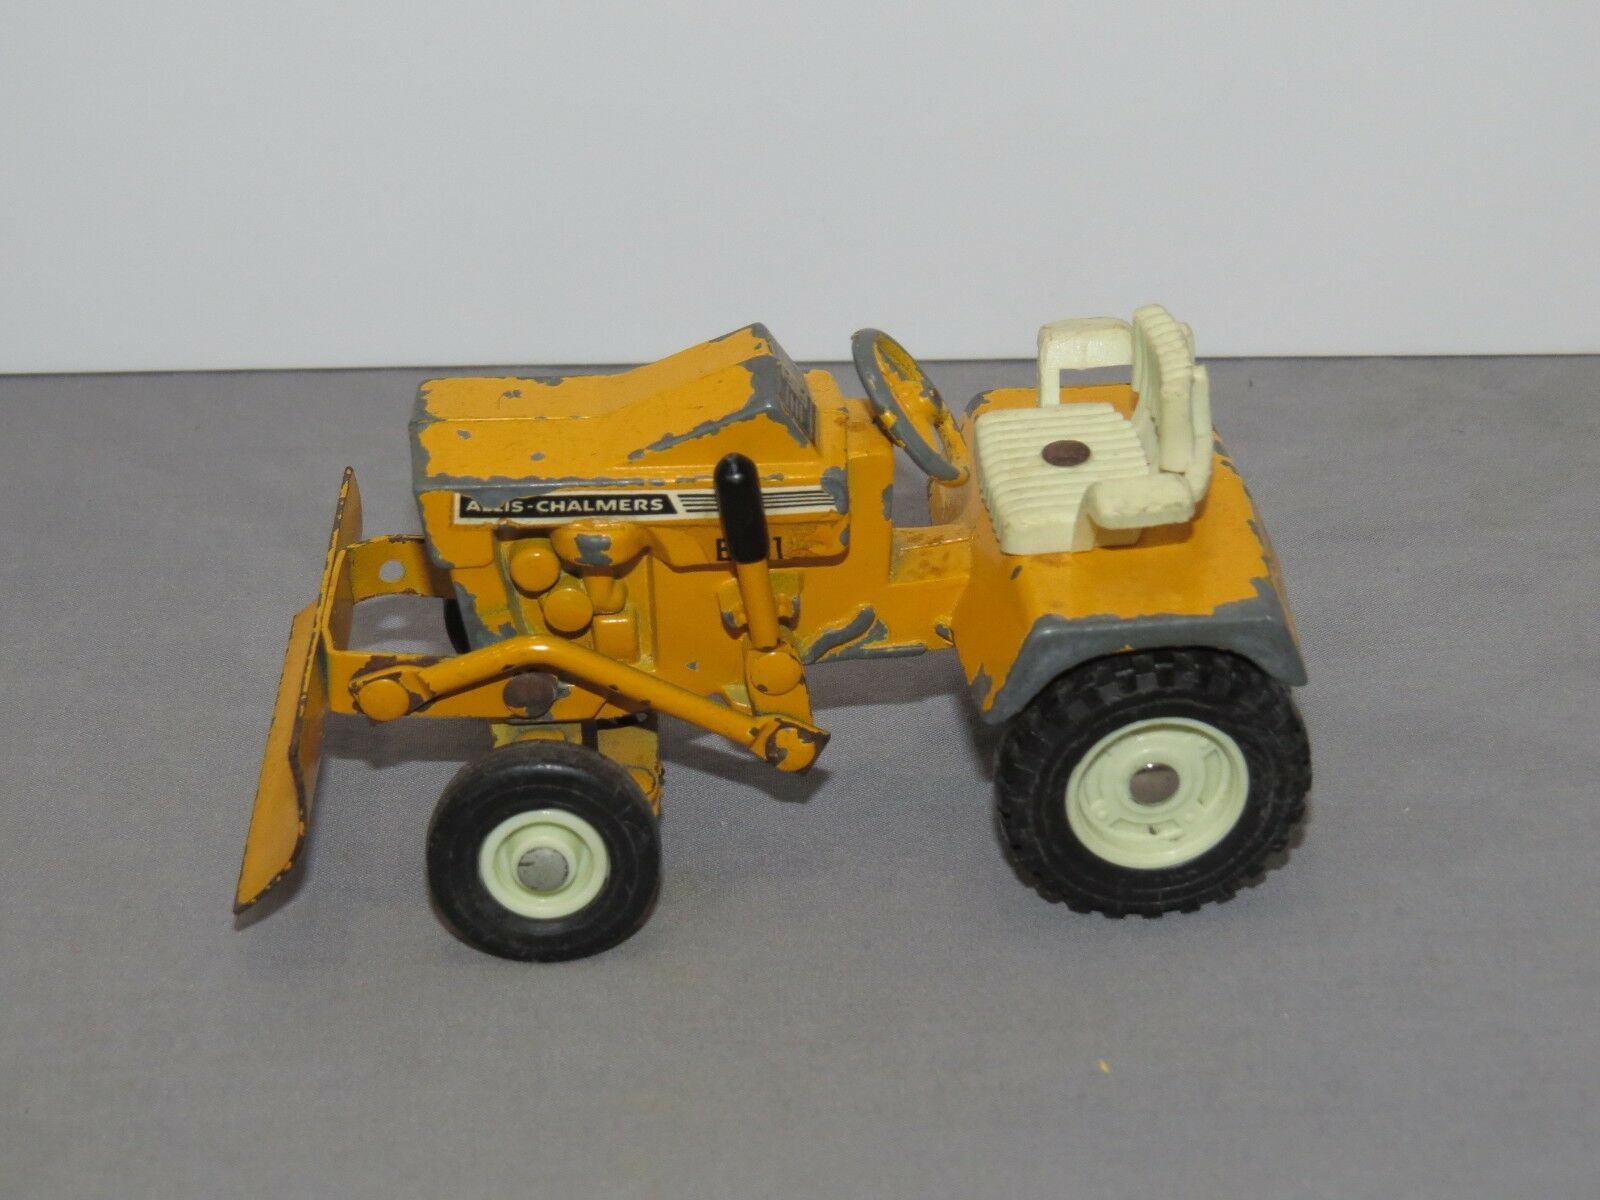 Vintage Ertl Allis Chalmers B-112 Lawn & Garden Toy Tractor 1/16 Original NICE